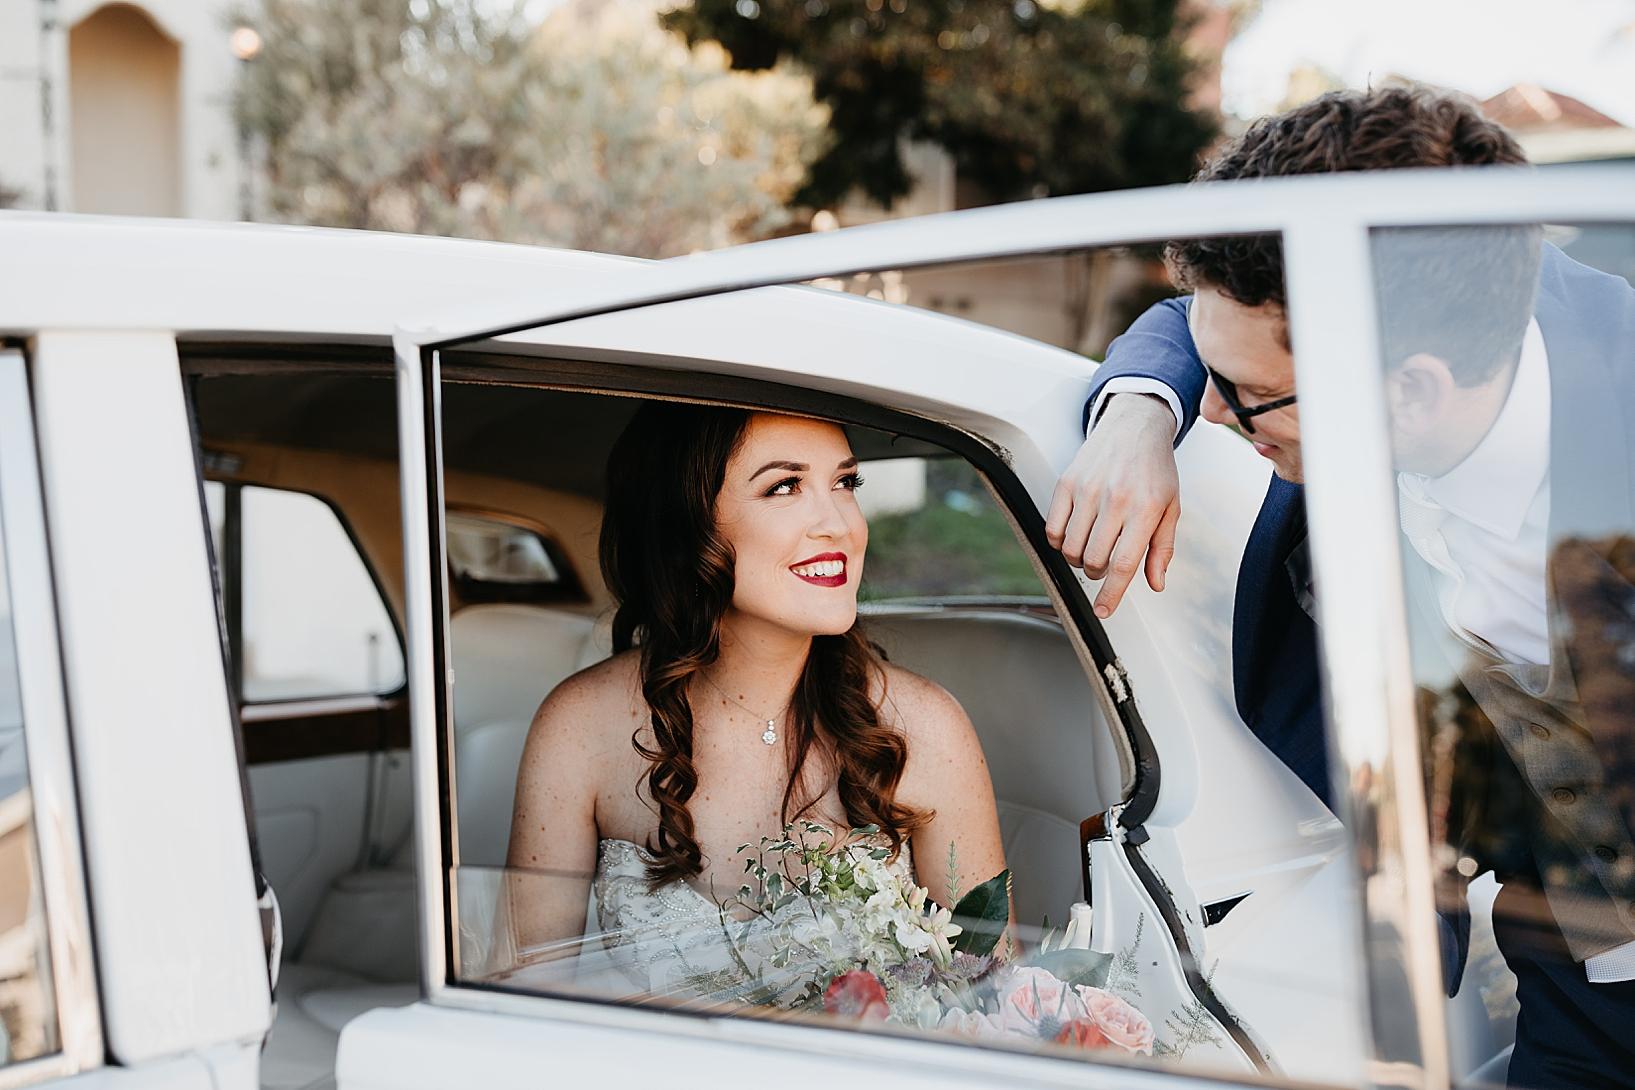 Brick-San-Diego-Winter-Wedding-26.jpg